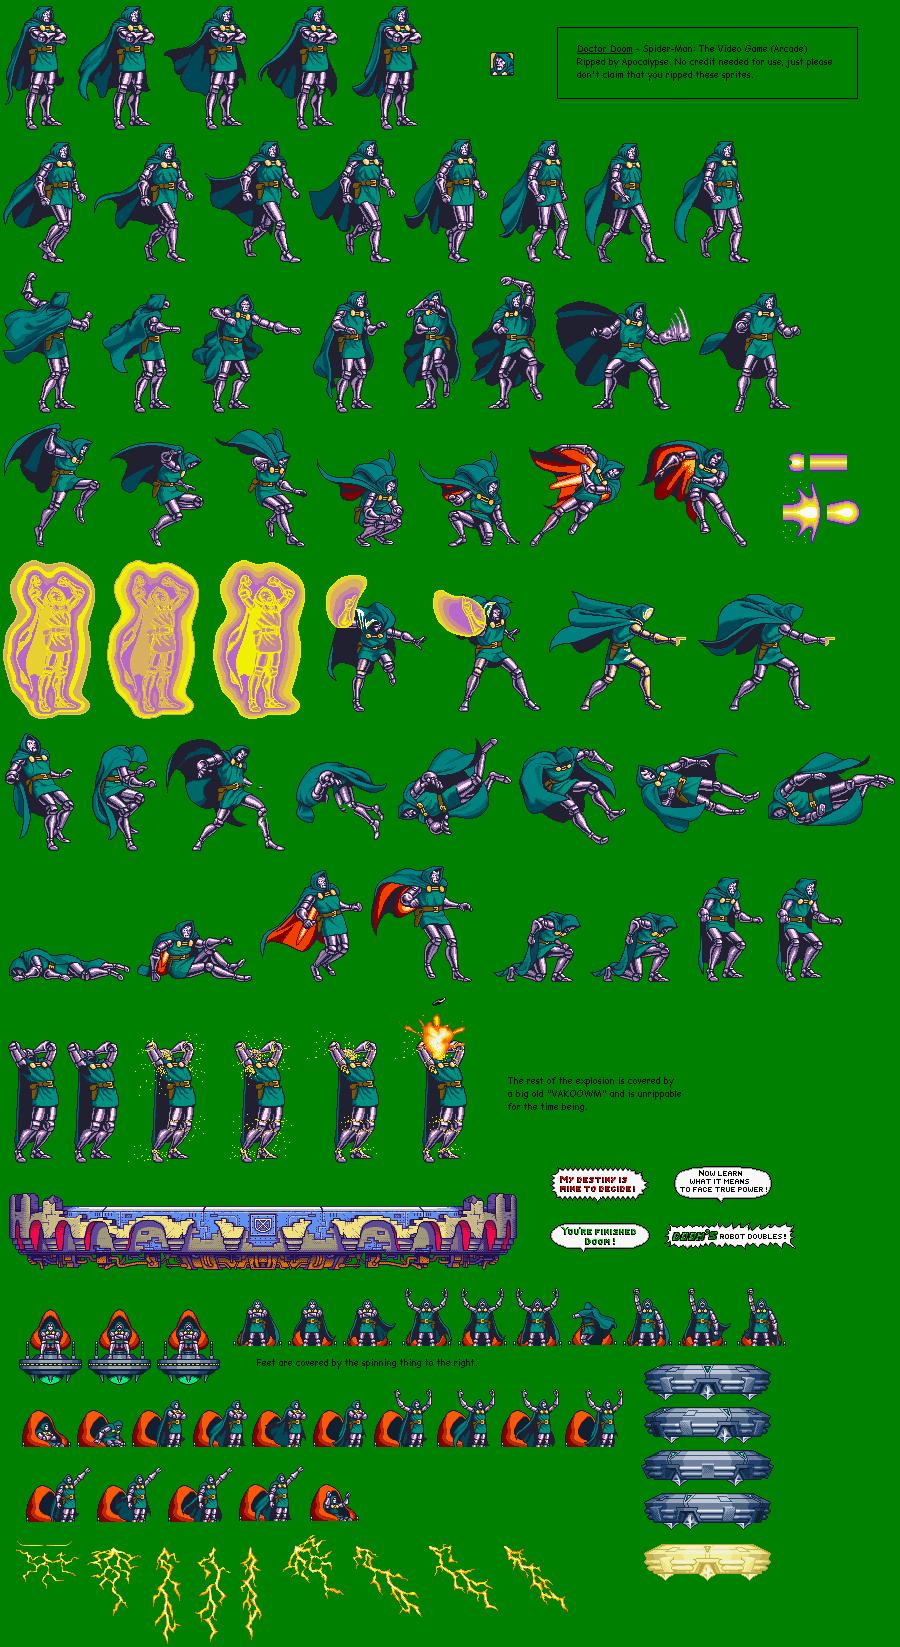 Arcade Spider Man The Video Game Dr Doom The Spriters Resource